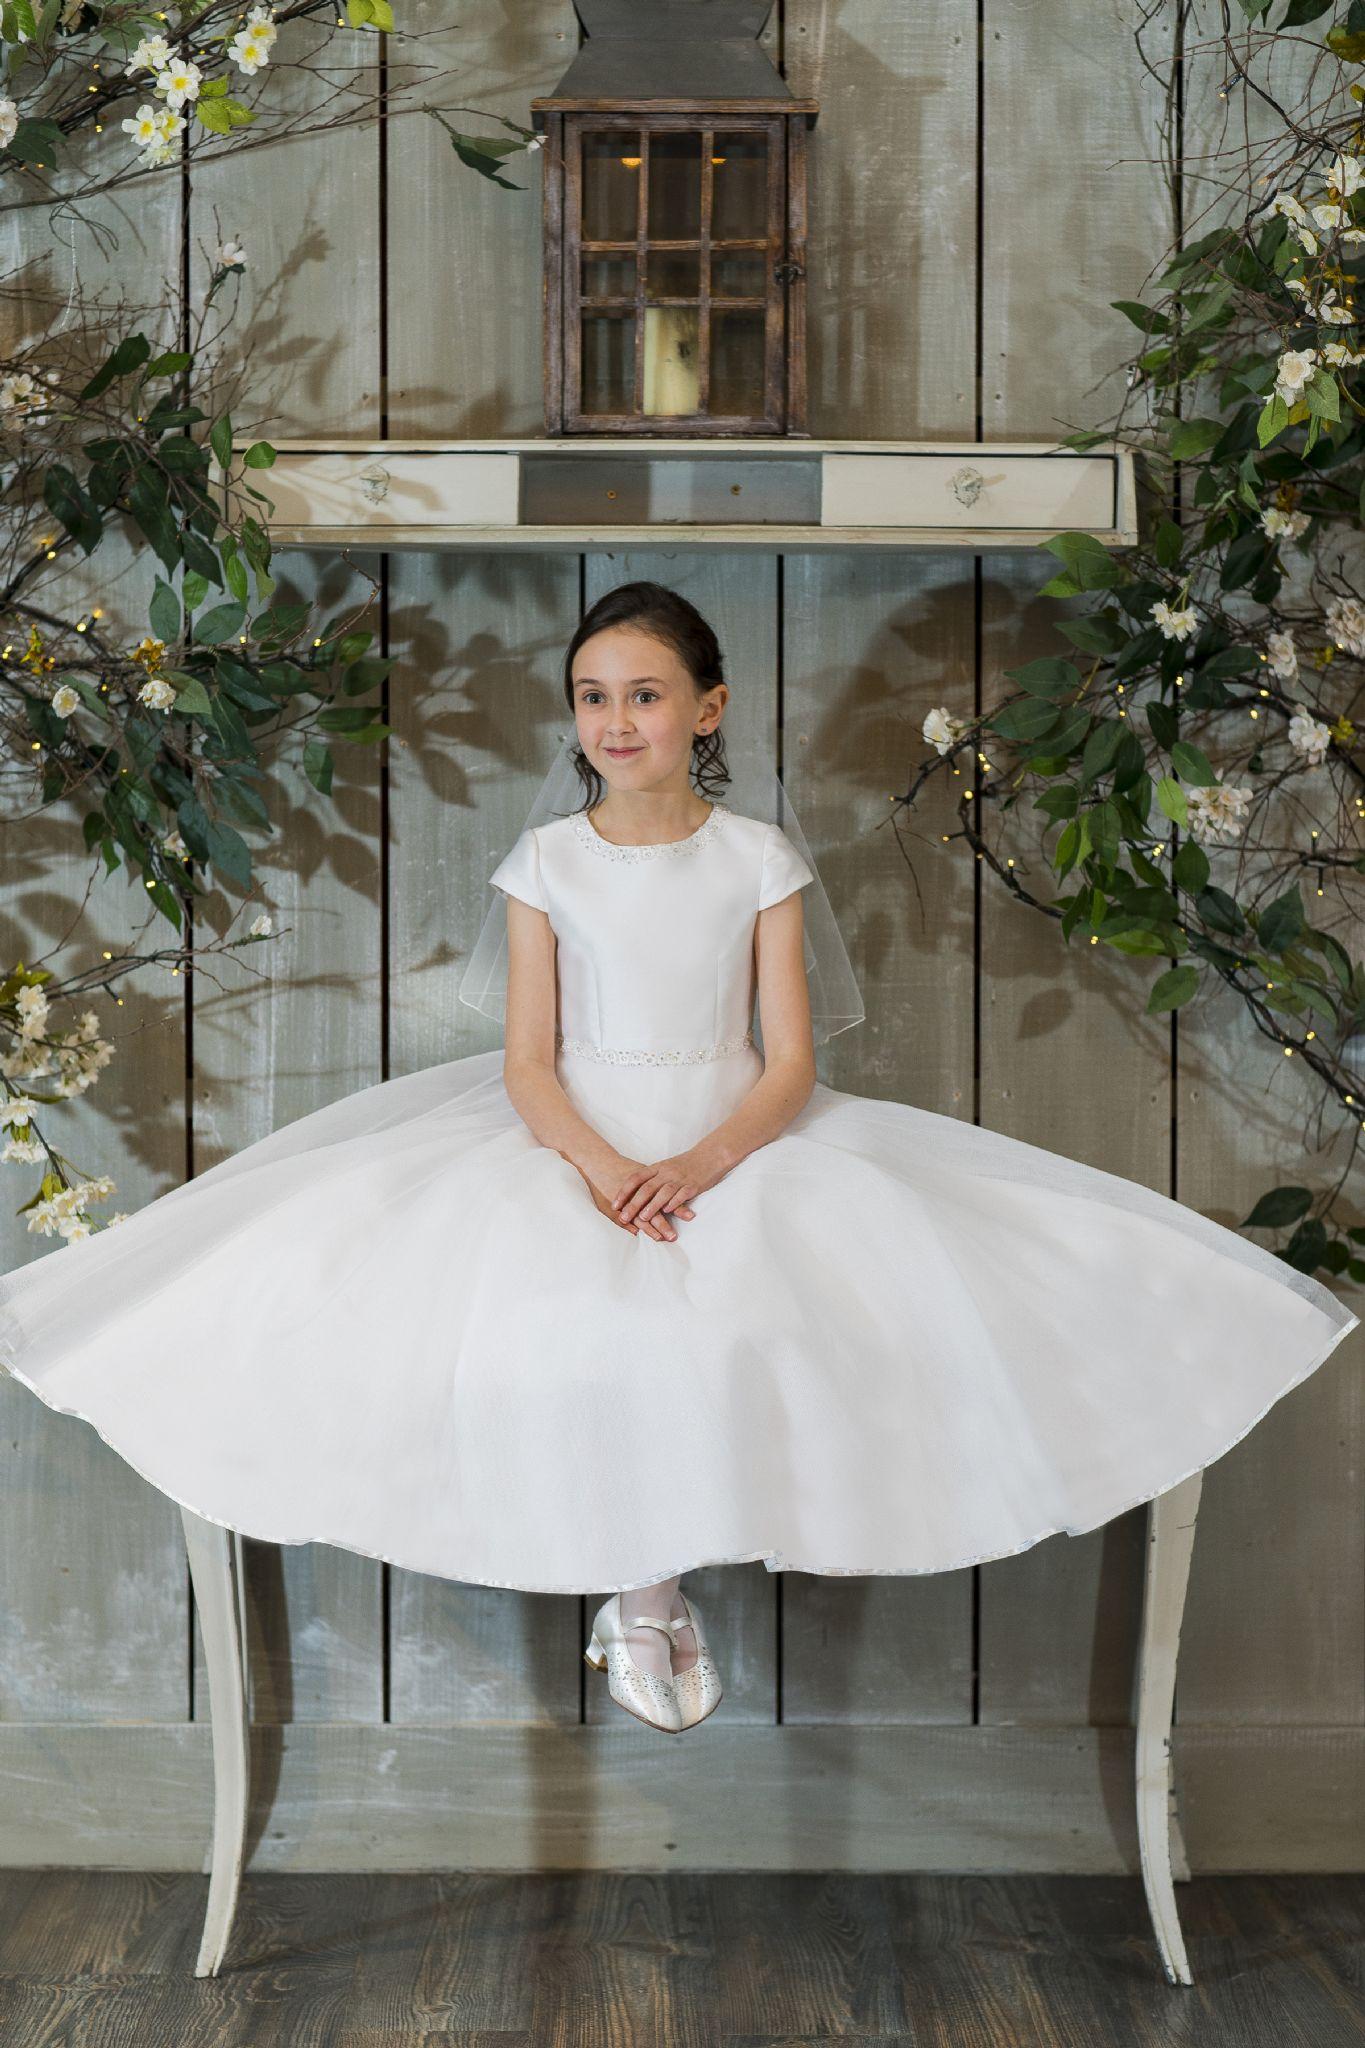 b58f9bca2 Isabella & Koko - Designer Communion Dress Collection - Beautiful ...